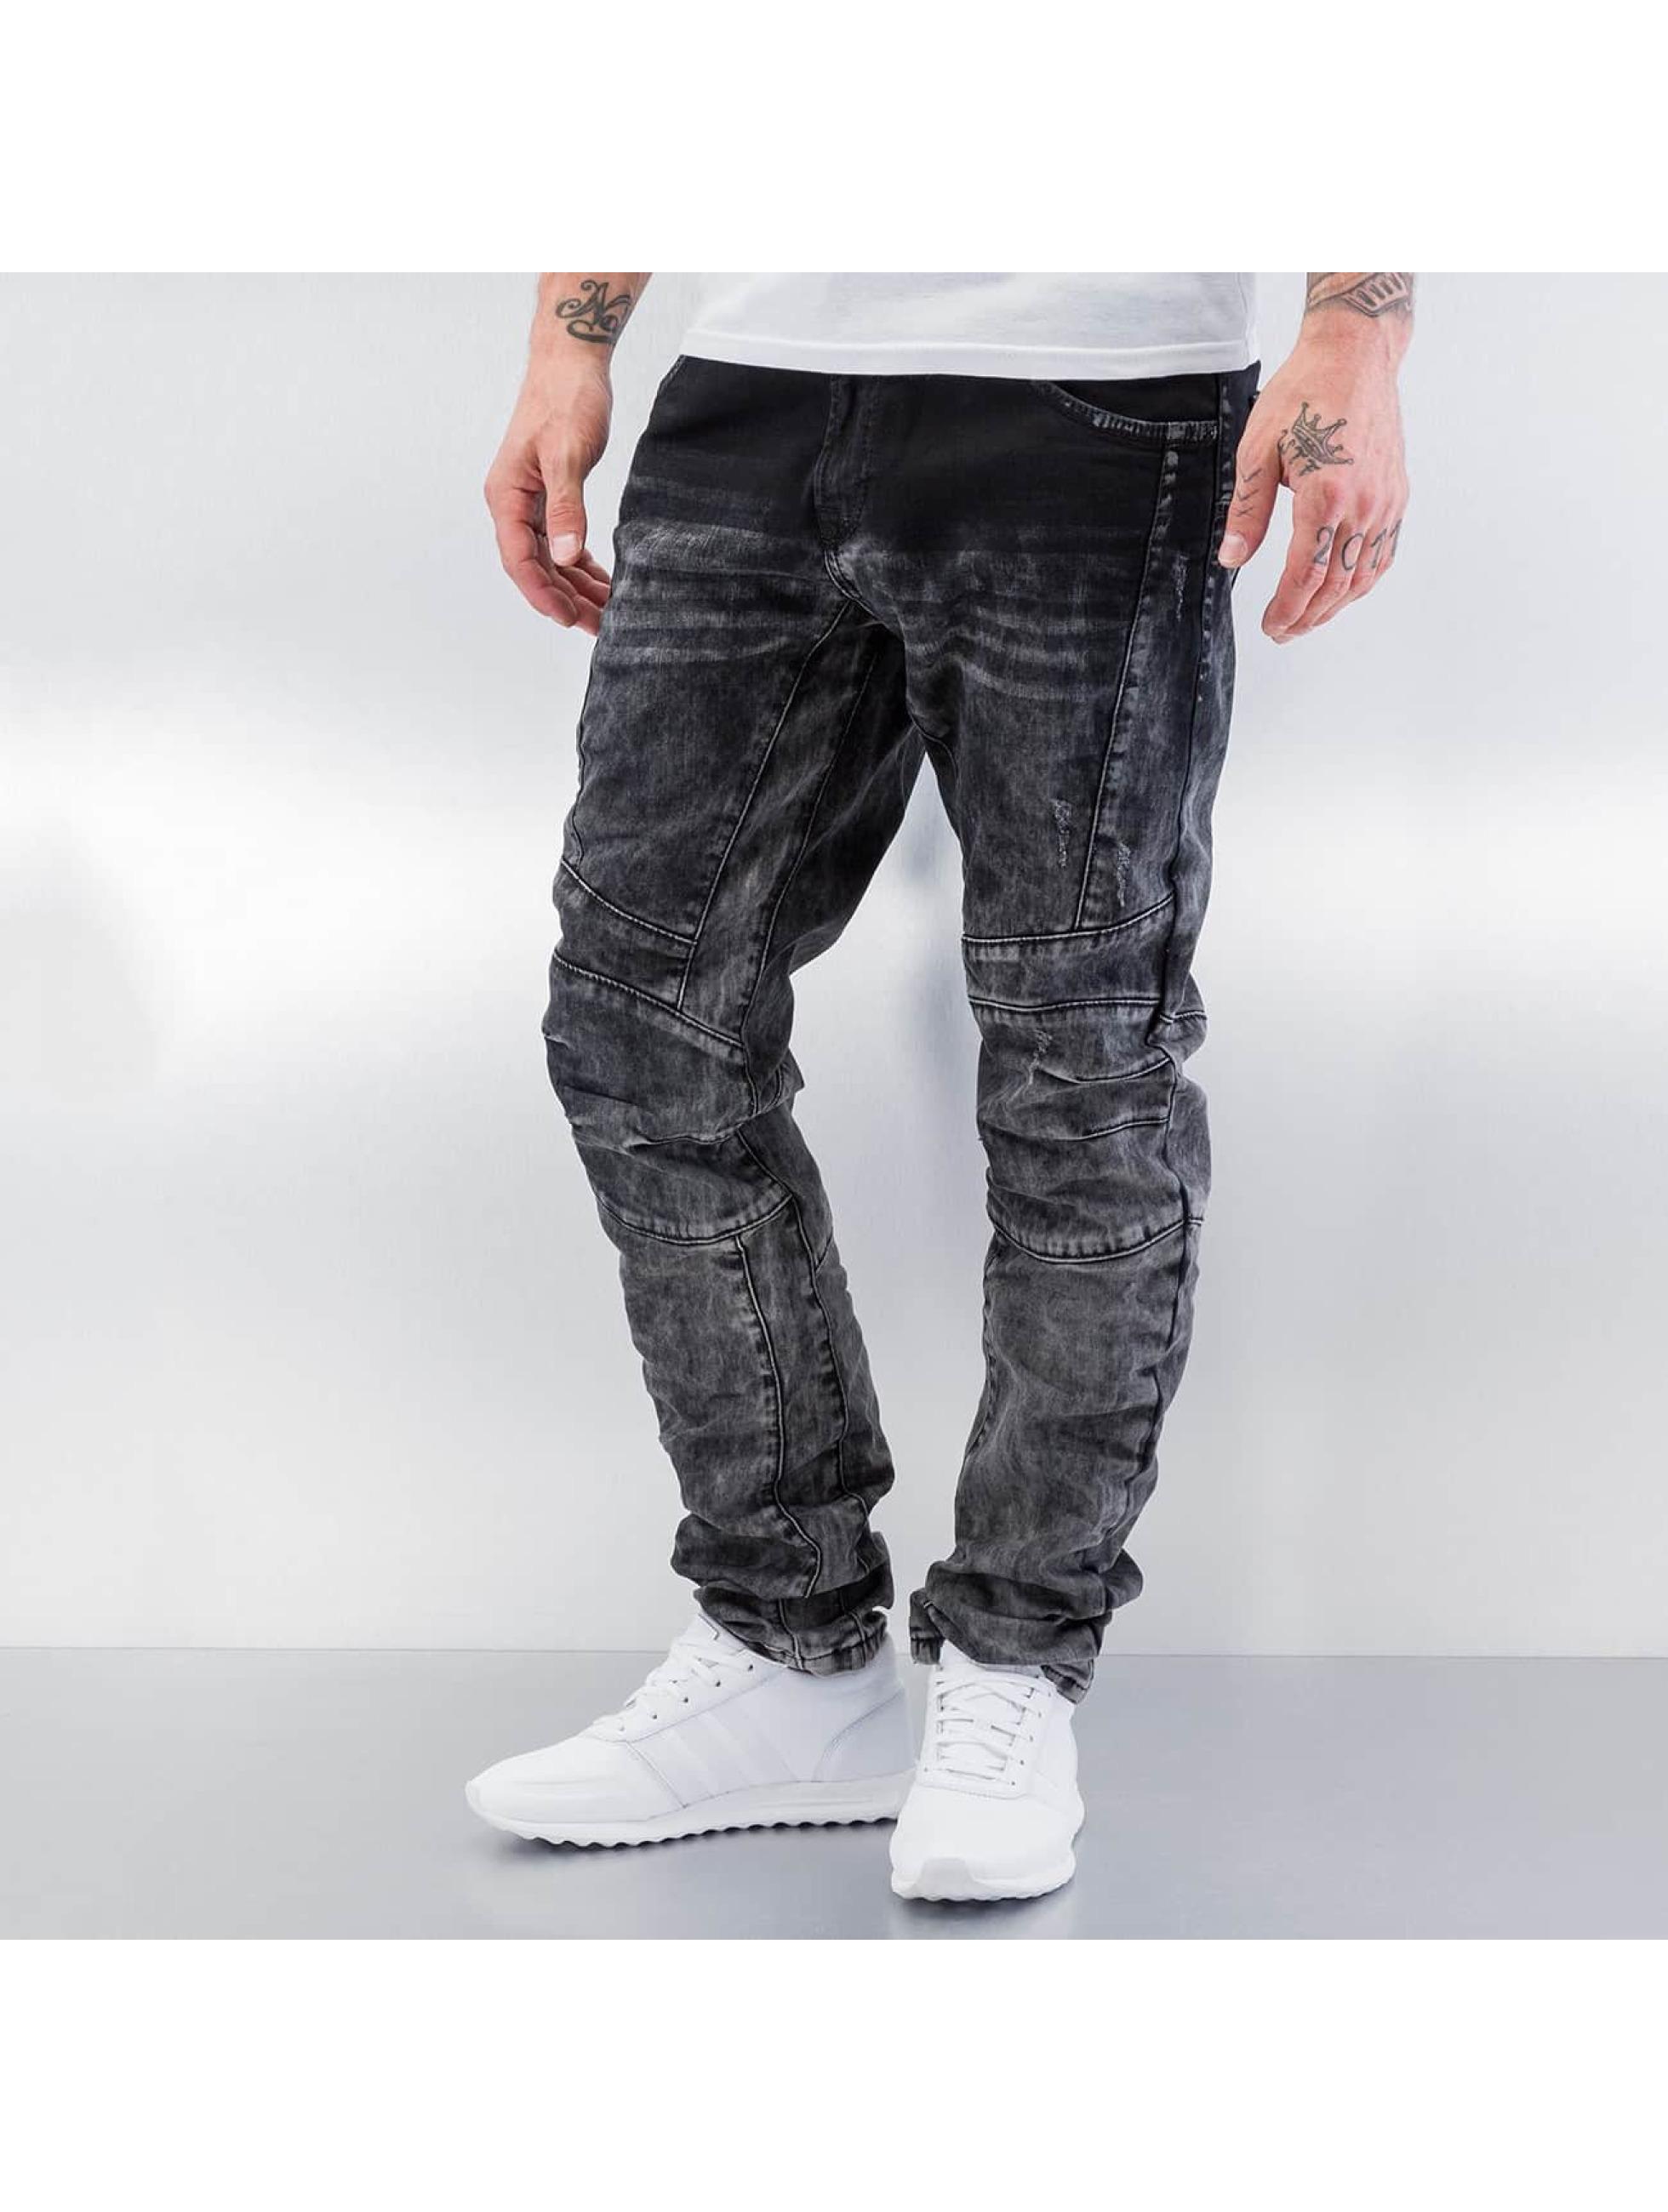 Cipo & Baxx Облегающие джинсы Washed серый